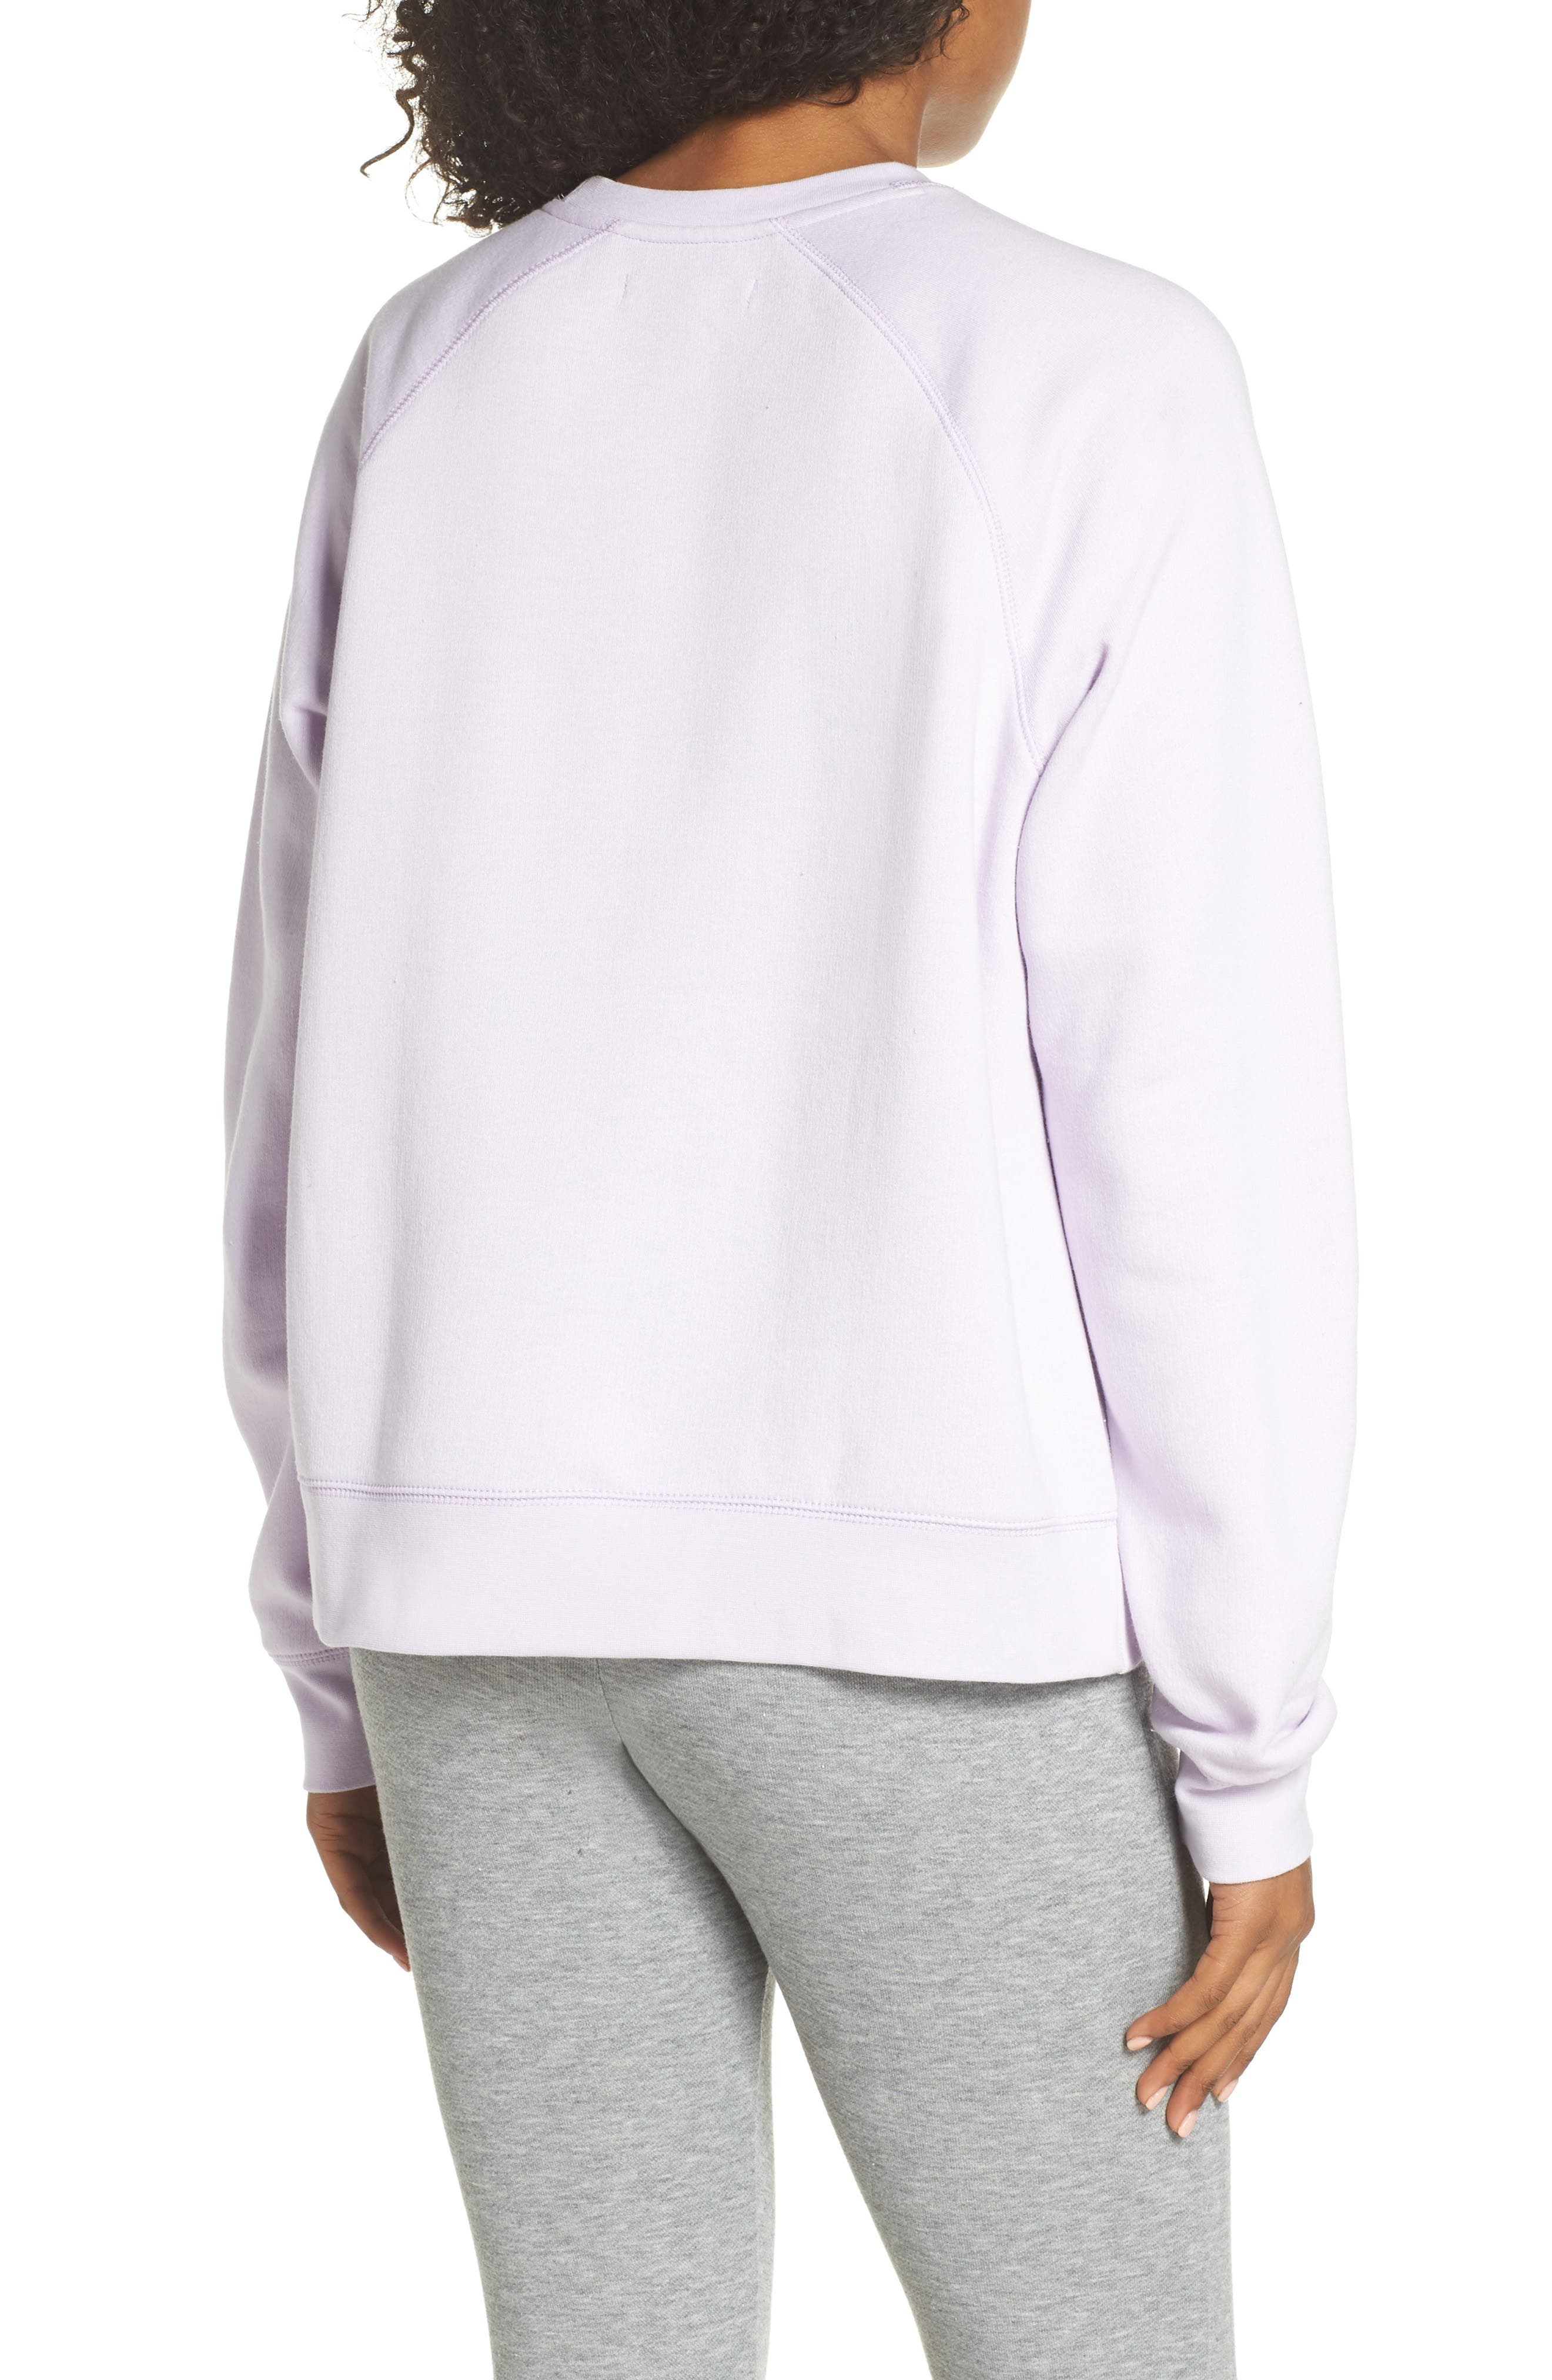 Beach Babe Middle Sister Crewneck Sweatshirt,                             Alternate thumbnail 2, color,                             Soft Lavender